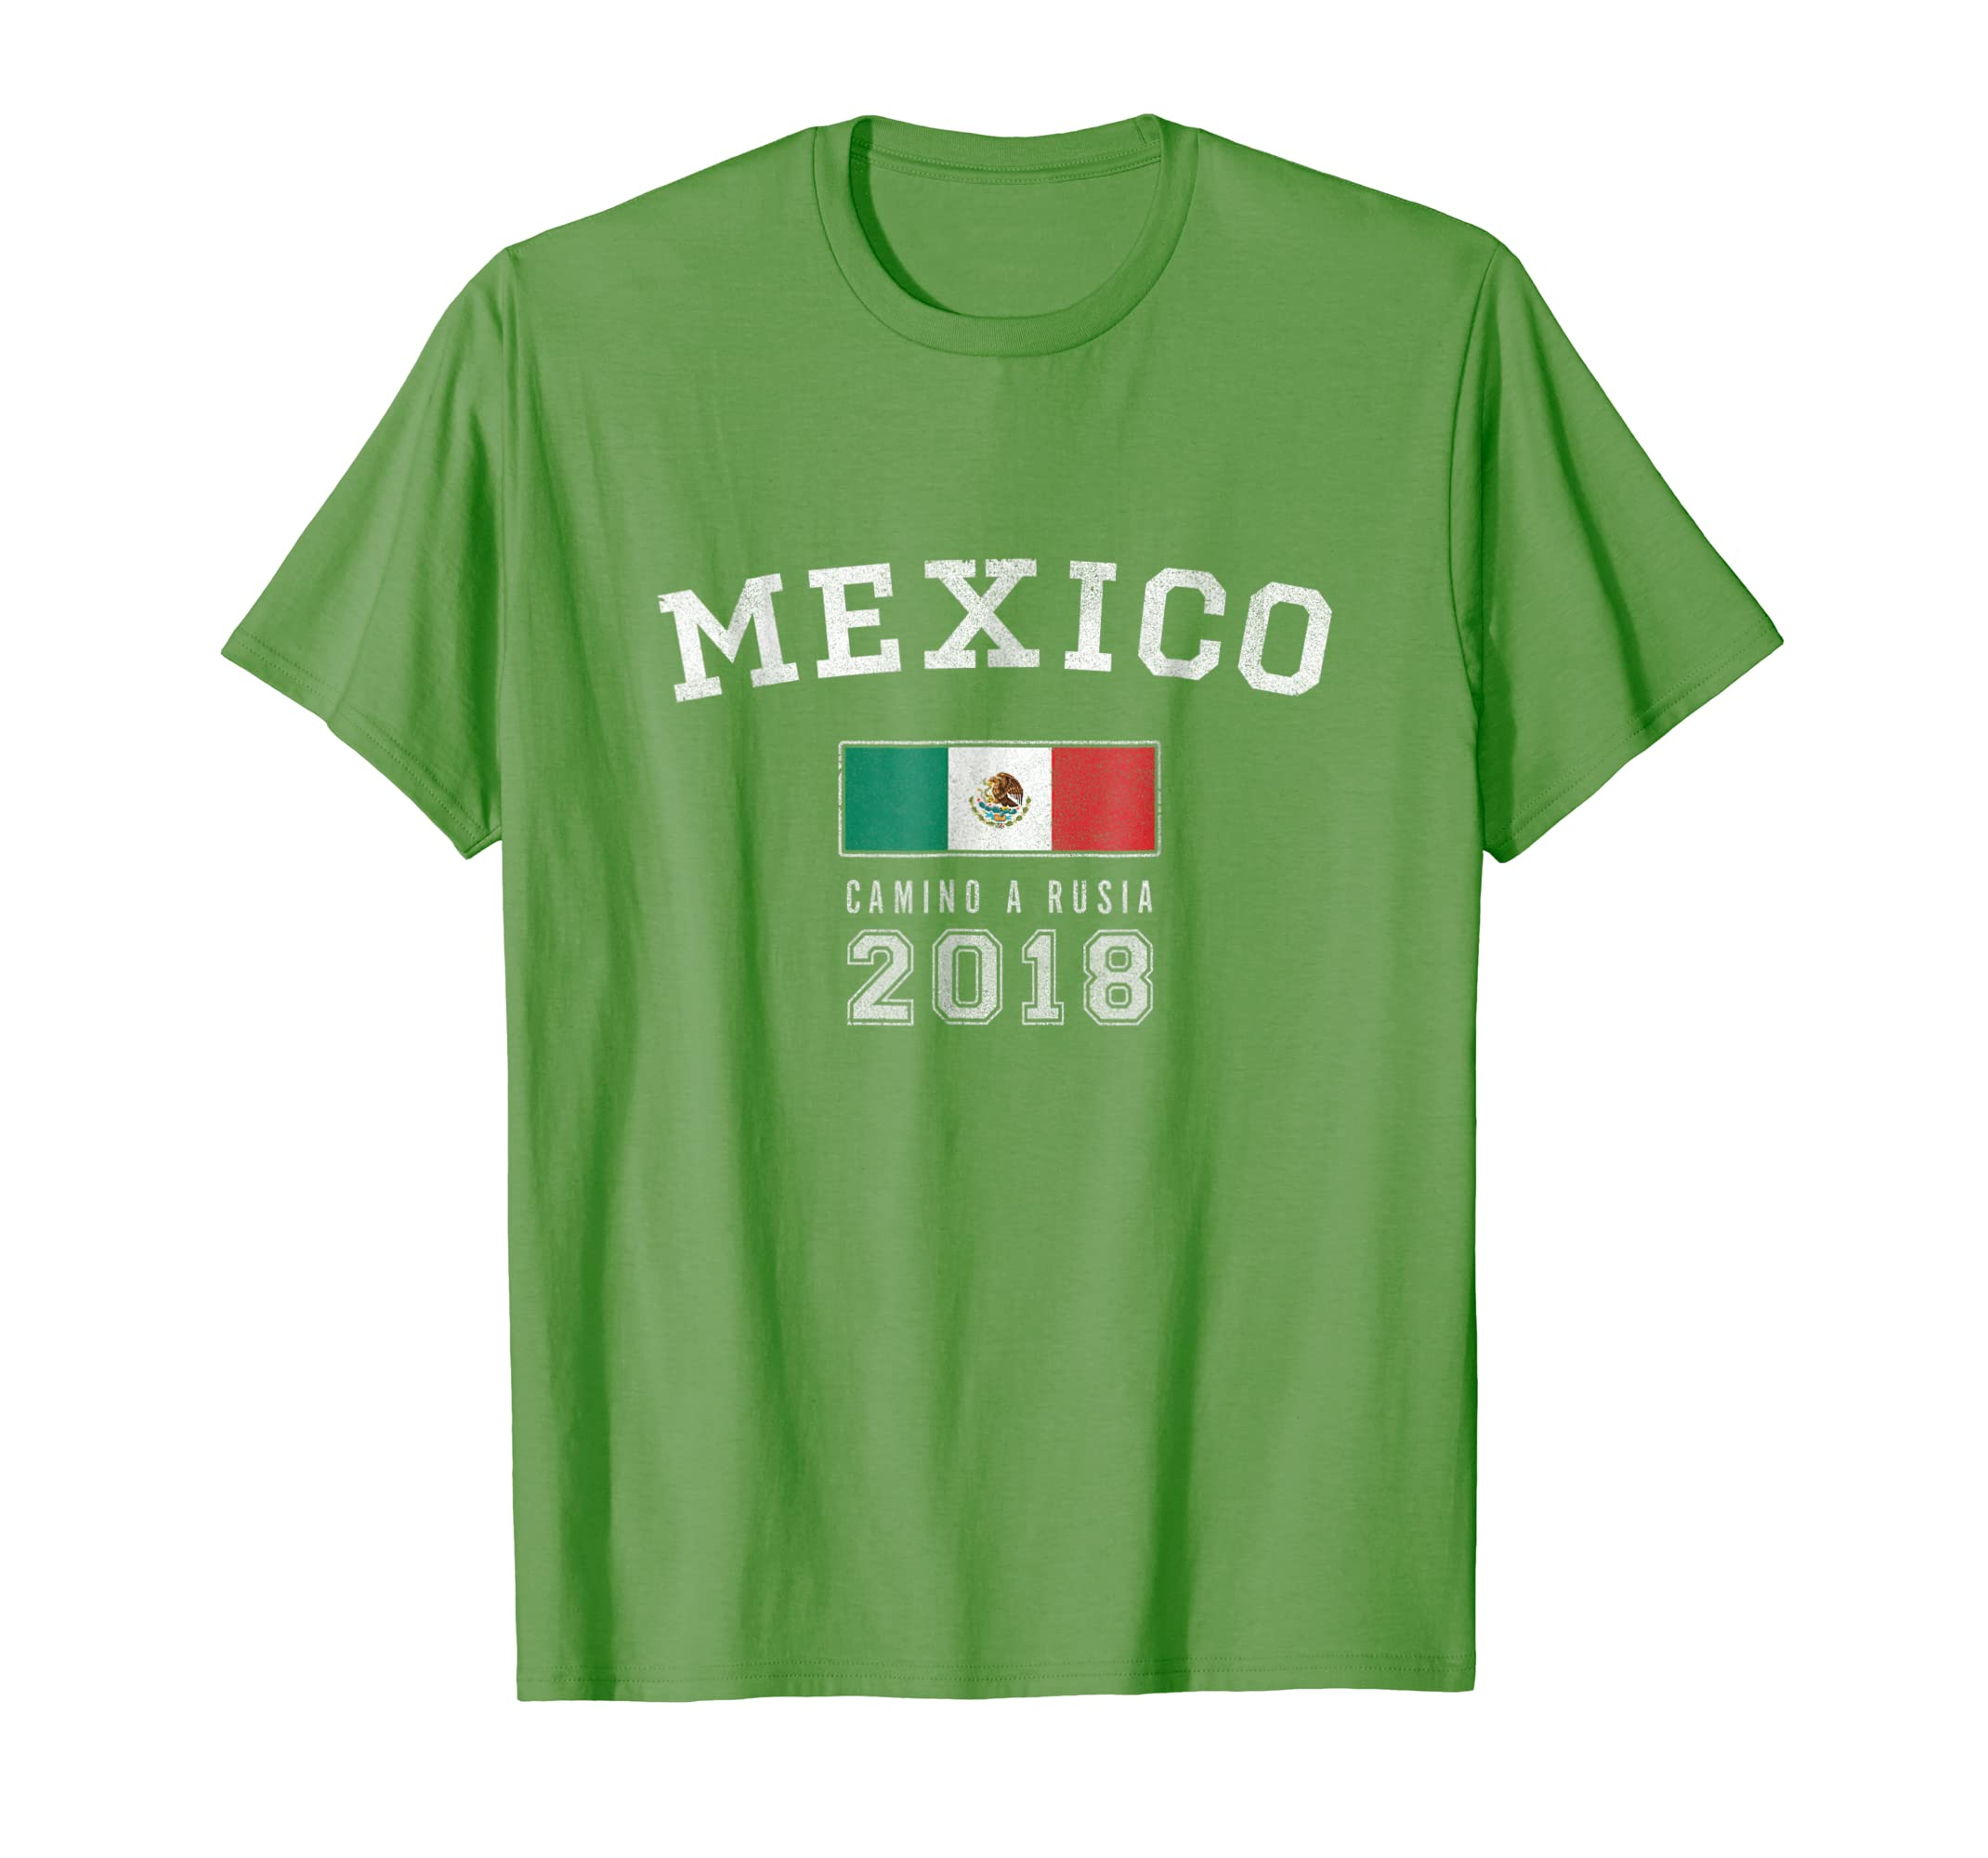 Amazon.com: Mexico, Soccer, Rusia 2018 tshirt - Camiseta Futbol Tee: Clothing